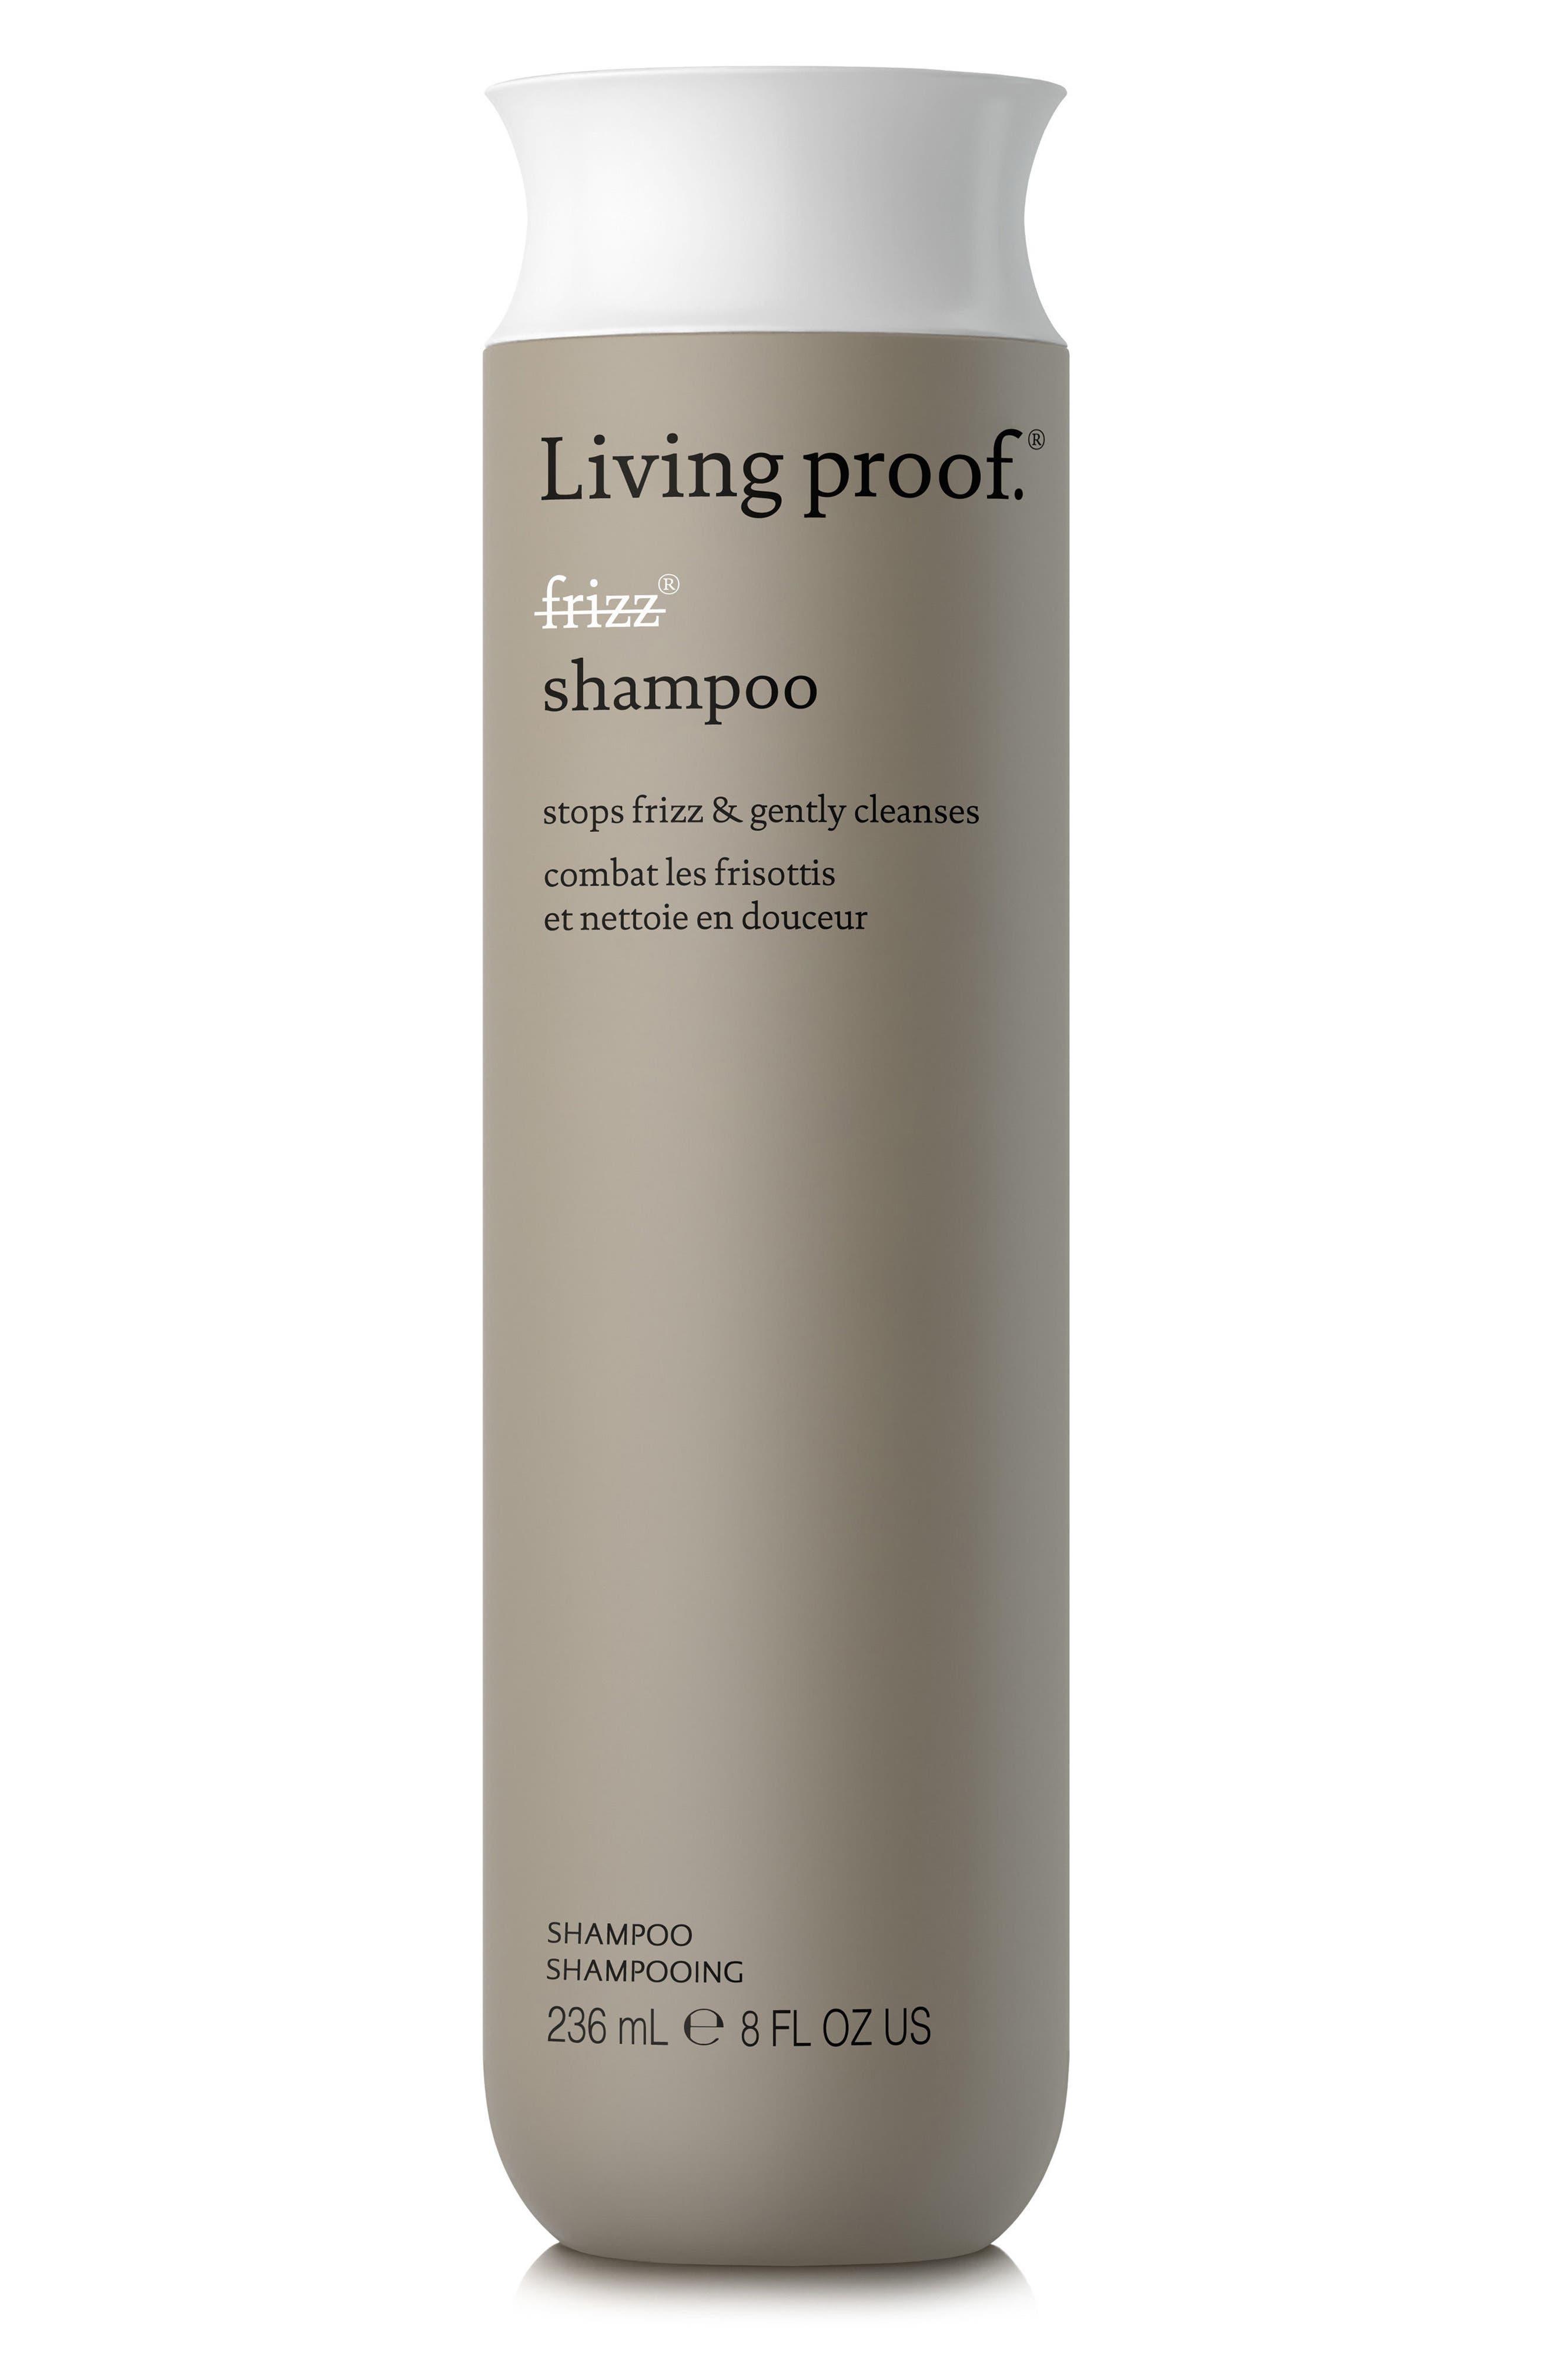 Living proof® No Frizz Shampoo